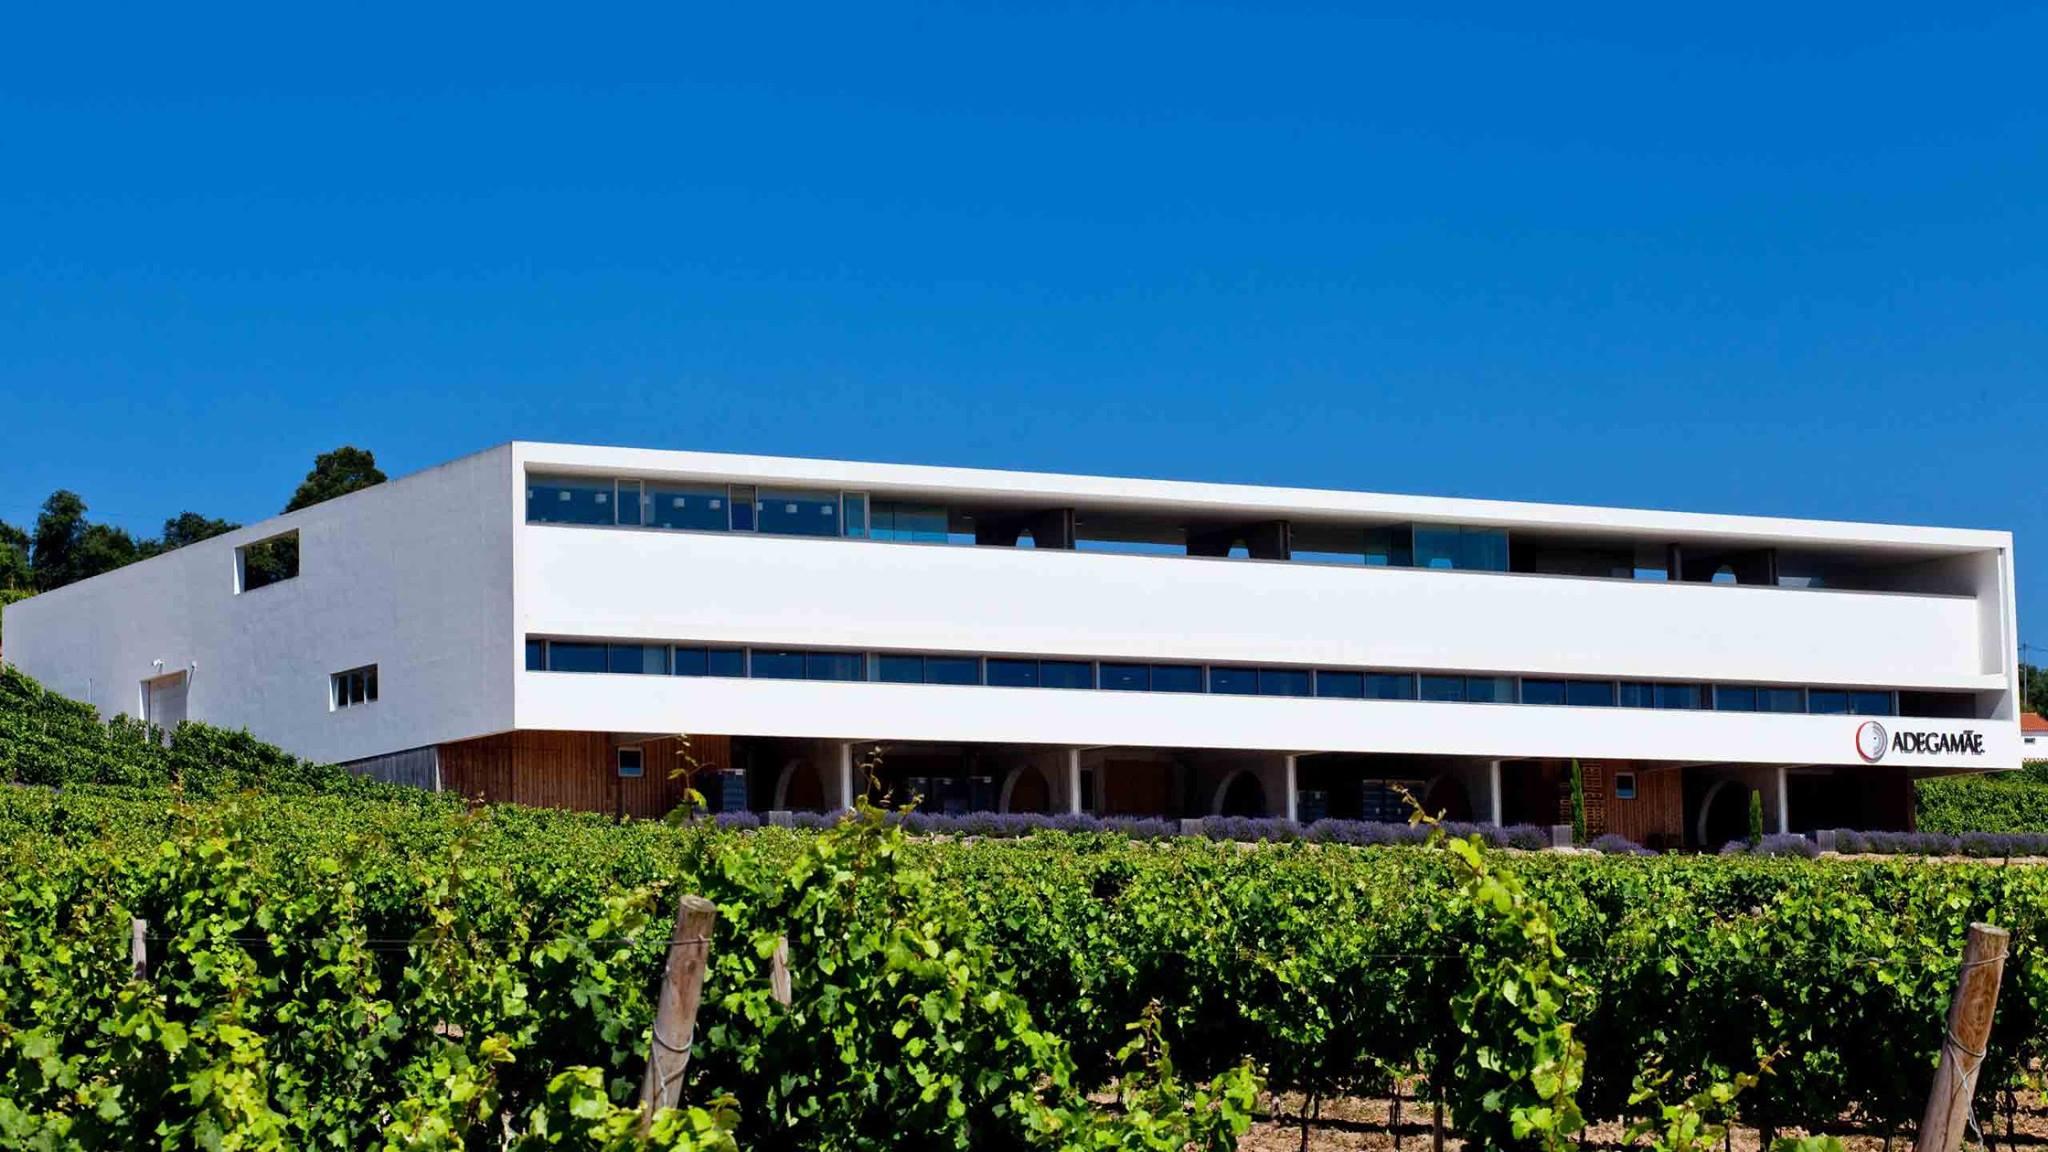 adega mãe, best wineries, wine tours in lisbon, wineries near lisbon, taste wine in lisbon, adega mae wines, dory, reserva, colheita